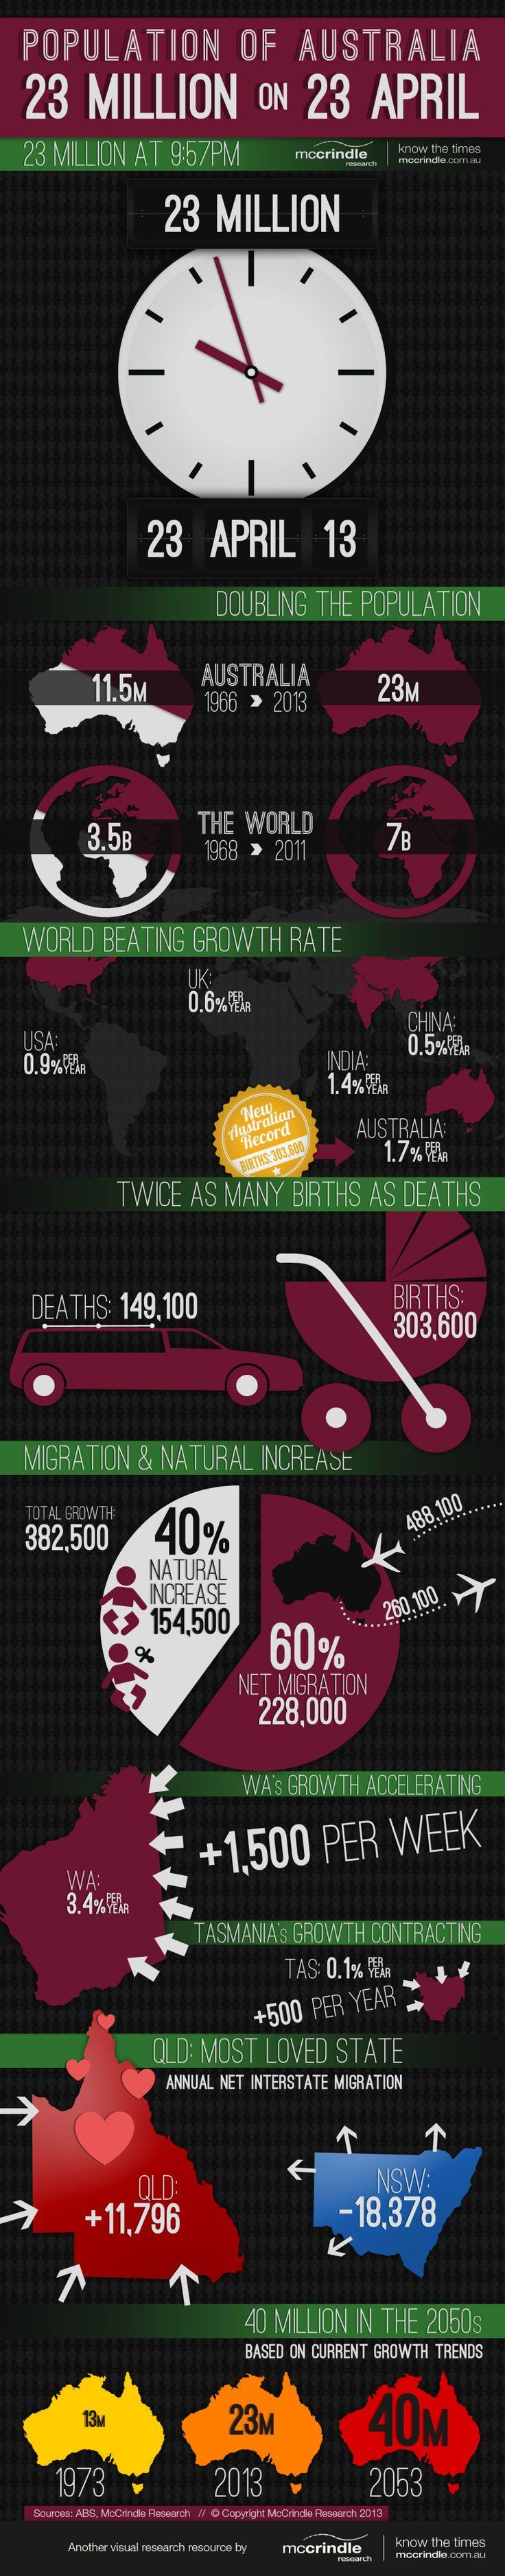 Population of Australia: 23 Million, 23 April, 2013 Infographic